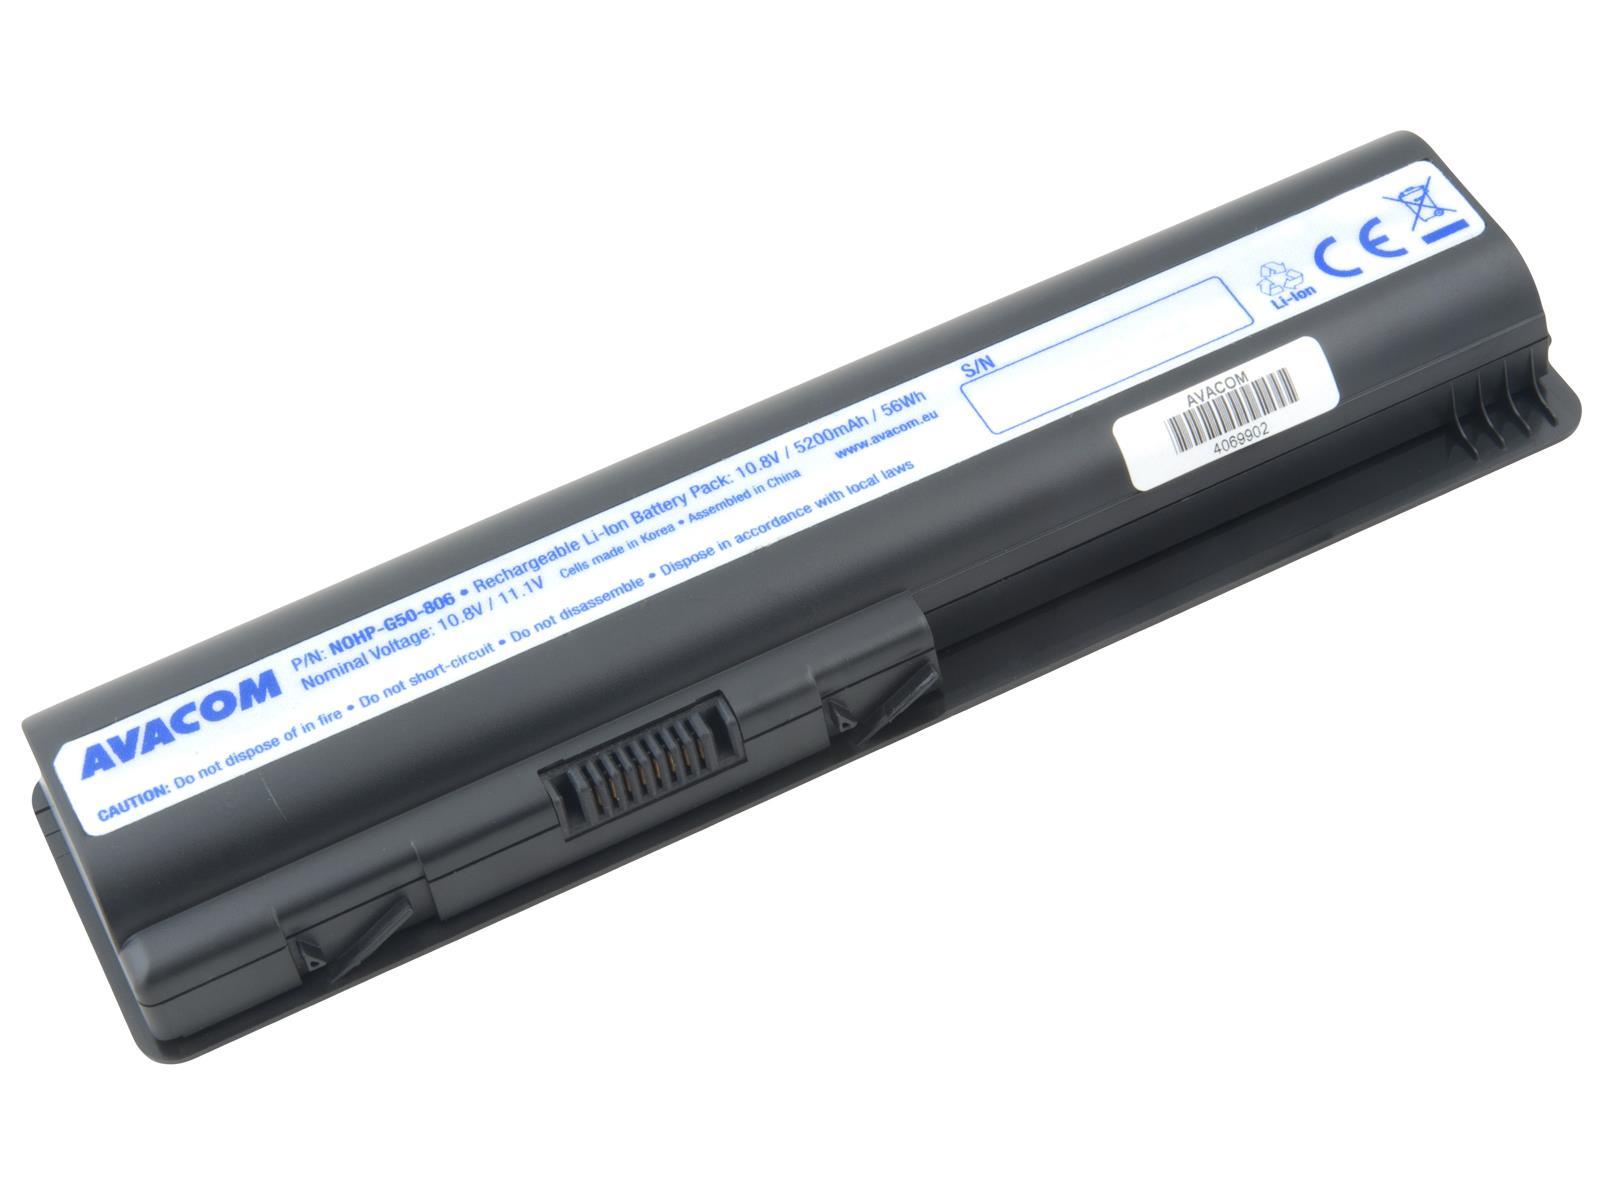 AVACOM baterie pro HP G50, G60, Pavilion DV6, DV5 series Li-Ion 10,8V 5200mAh/ 56Wh (NOHP-G50-806)